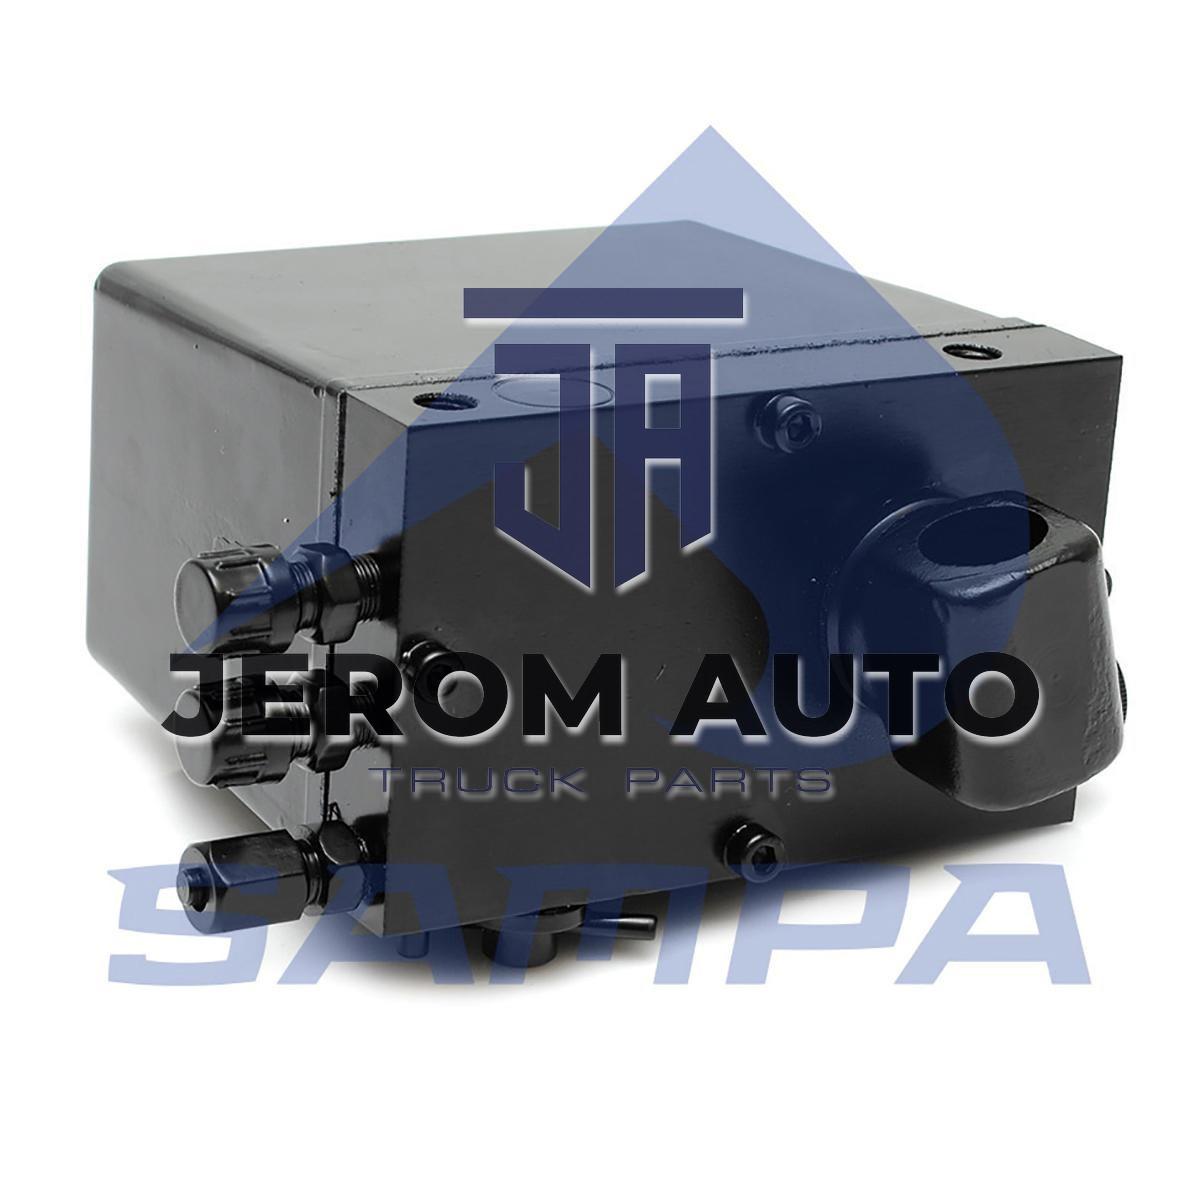 Насос подъёма кабины DAF LF55/CF65/75/85XF95/105/ 050.355/ 1450903